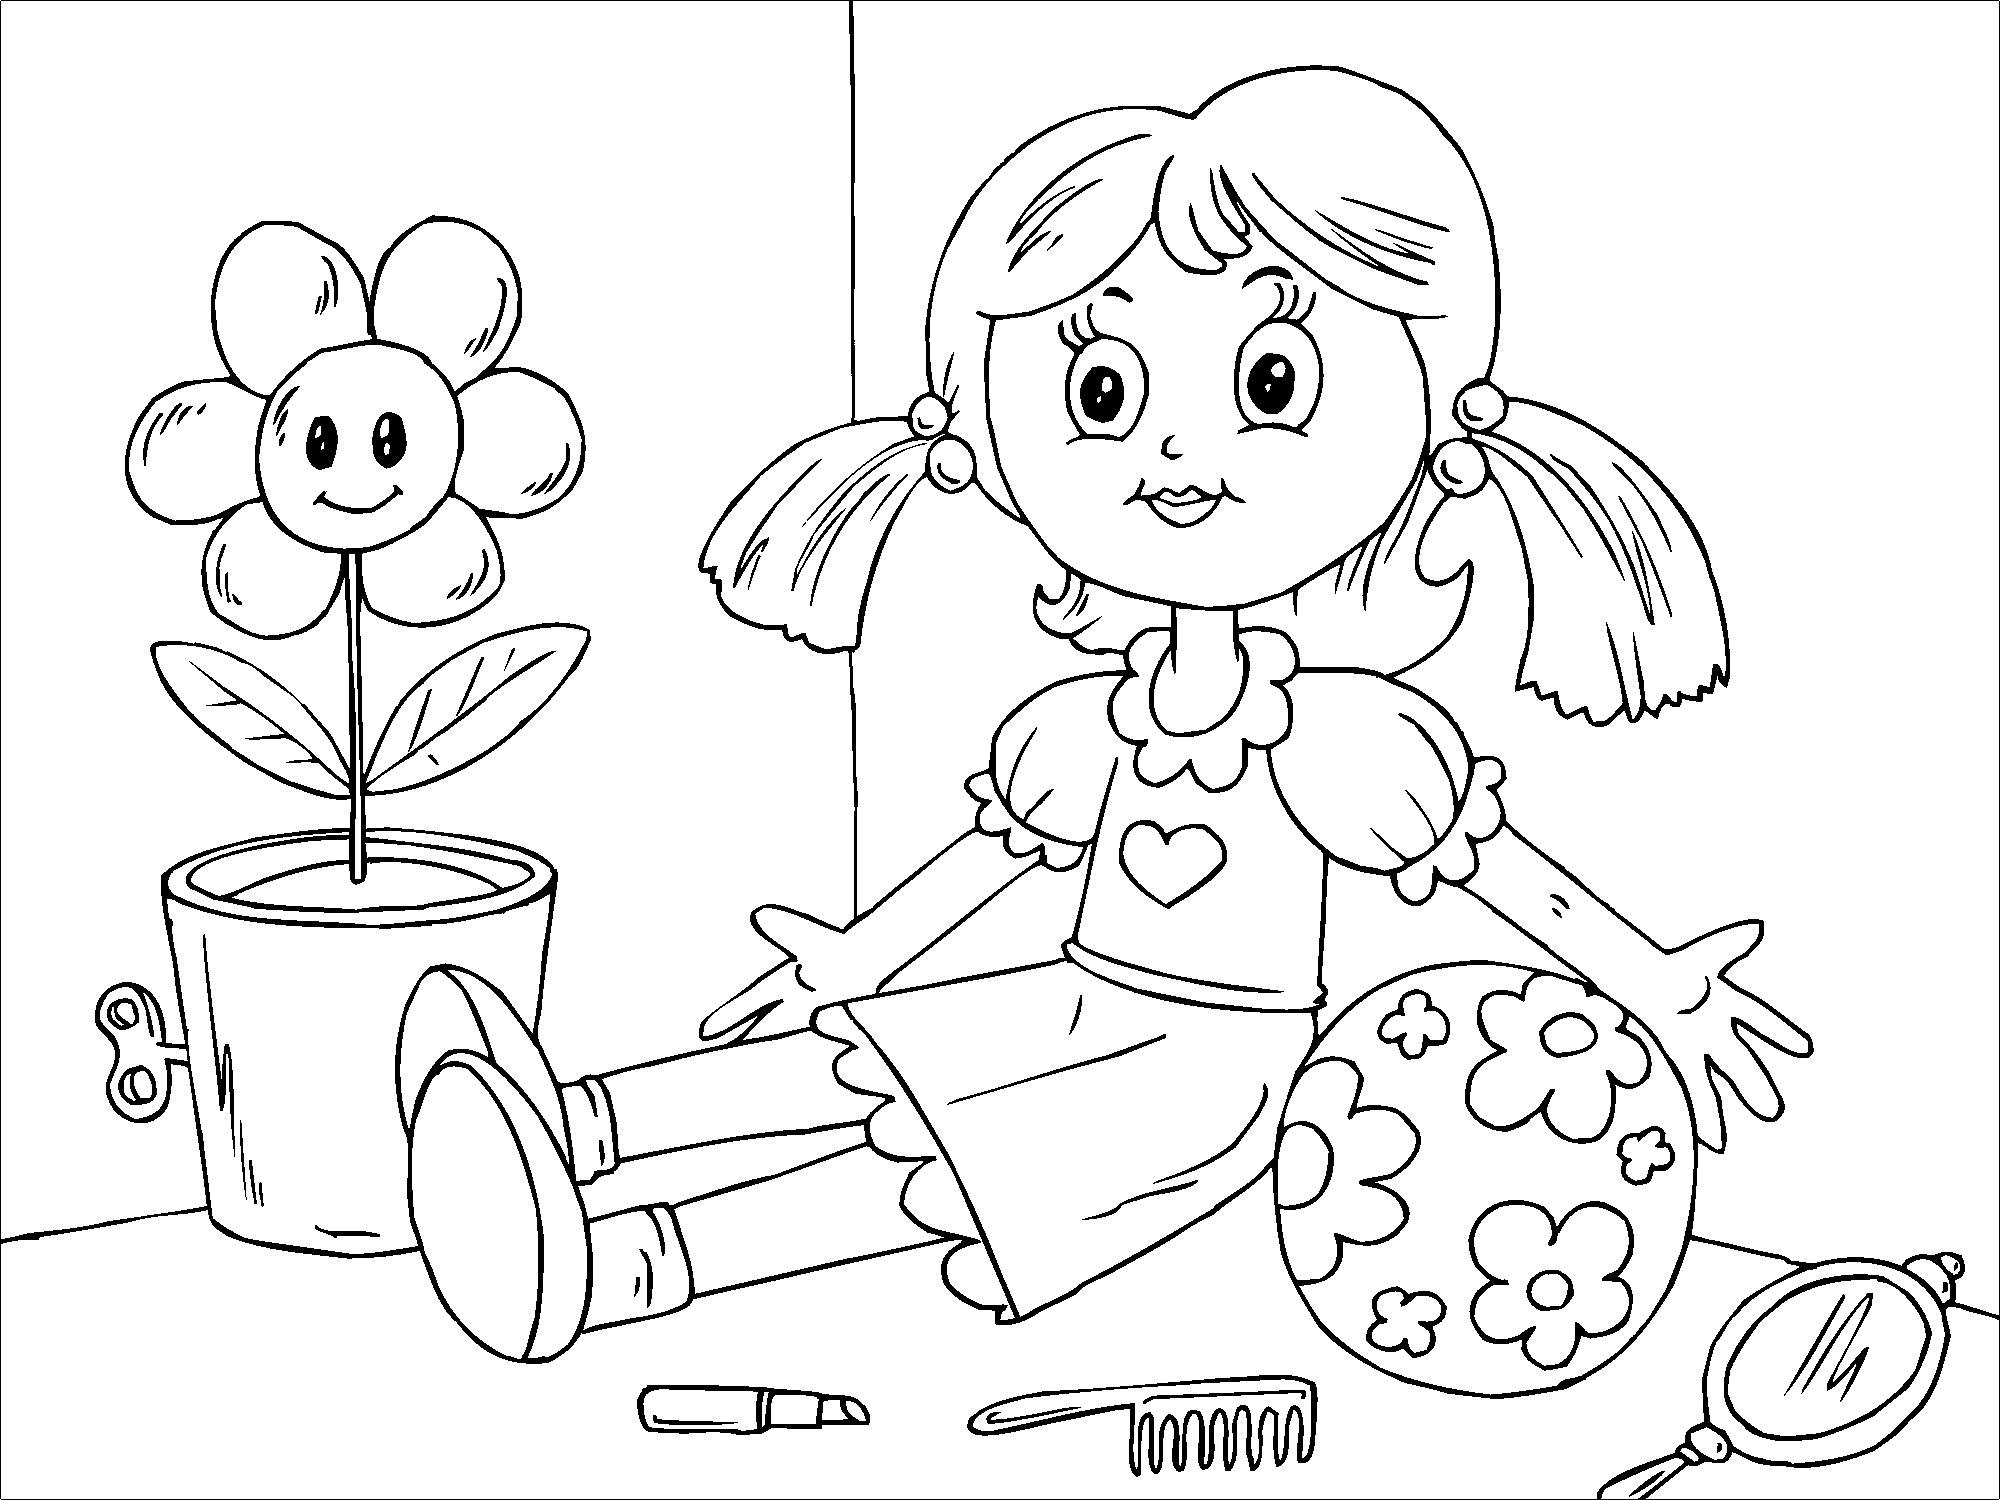 Dibujo para colorear muñeca - Img 22823